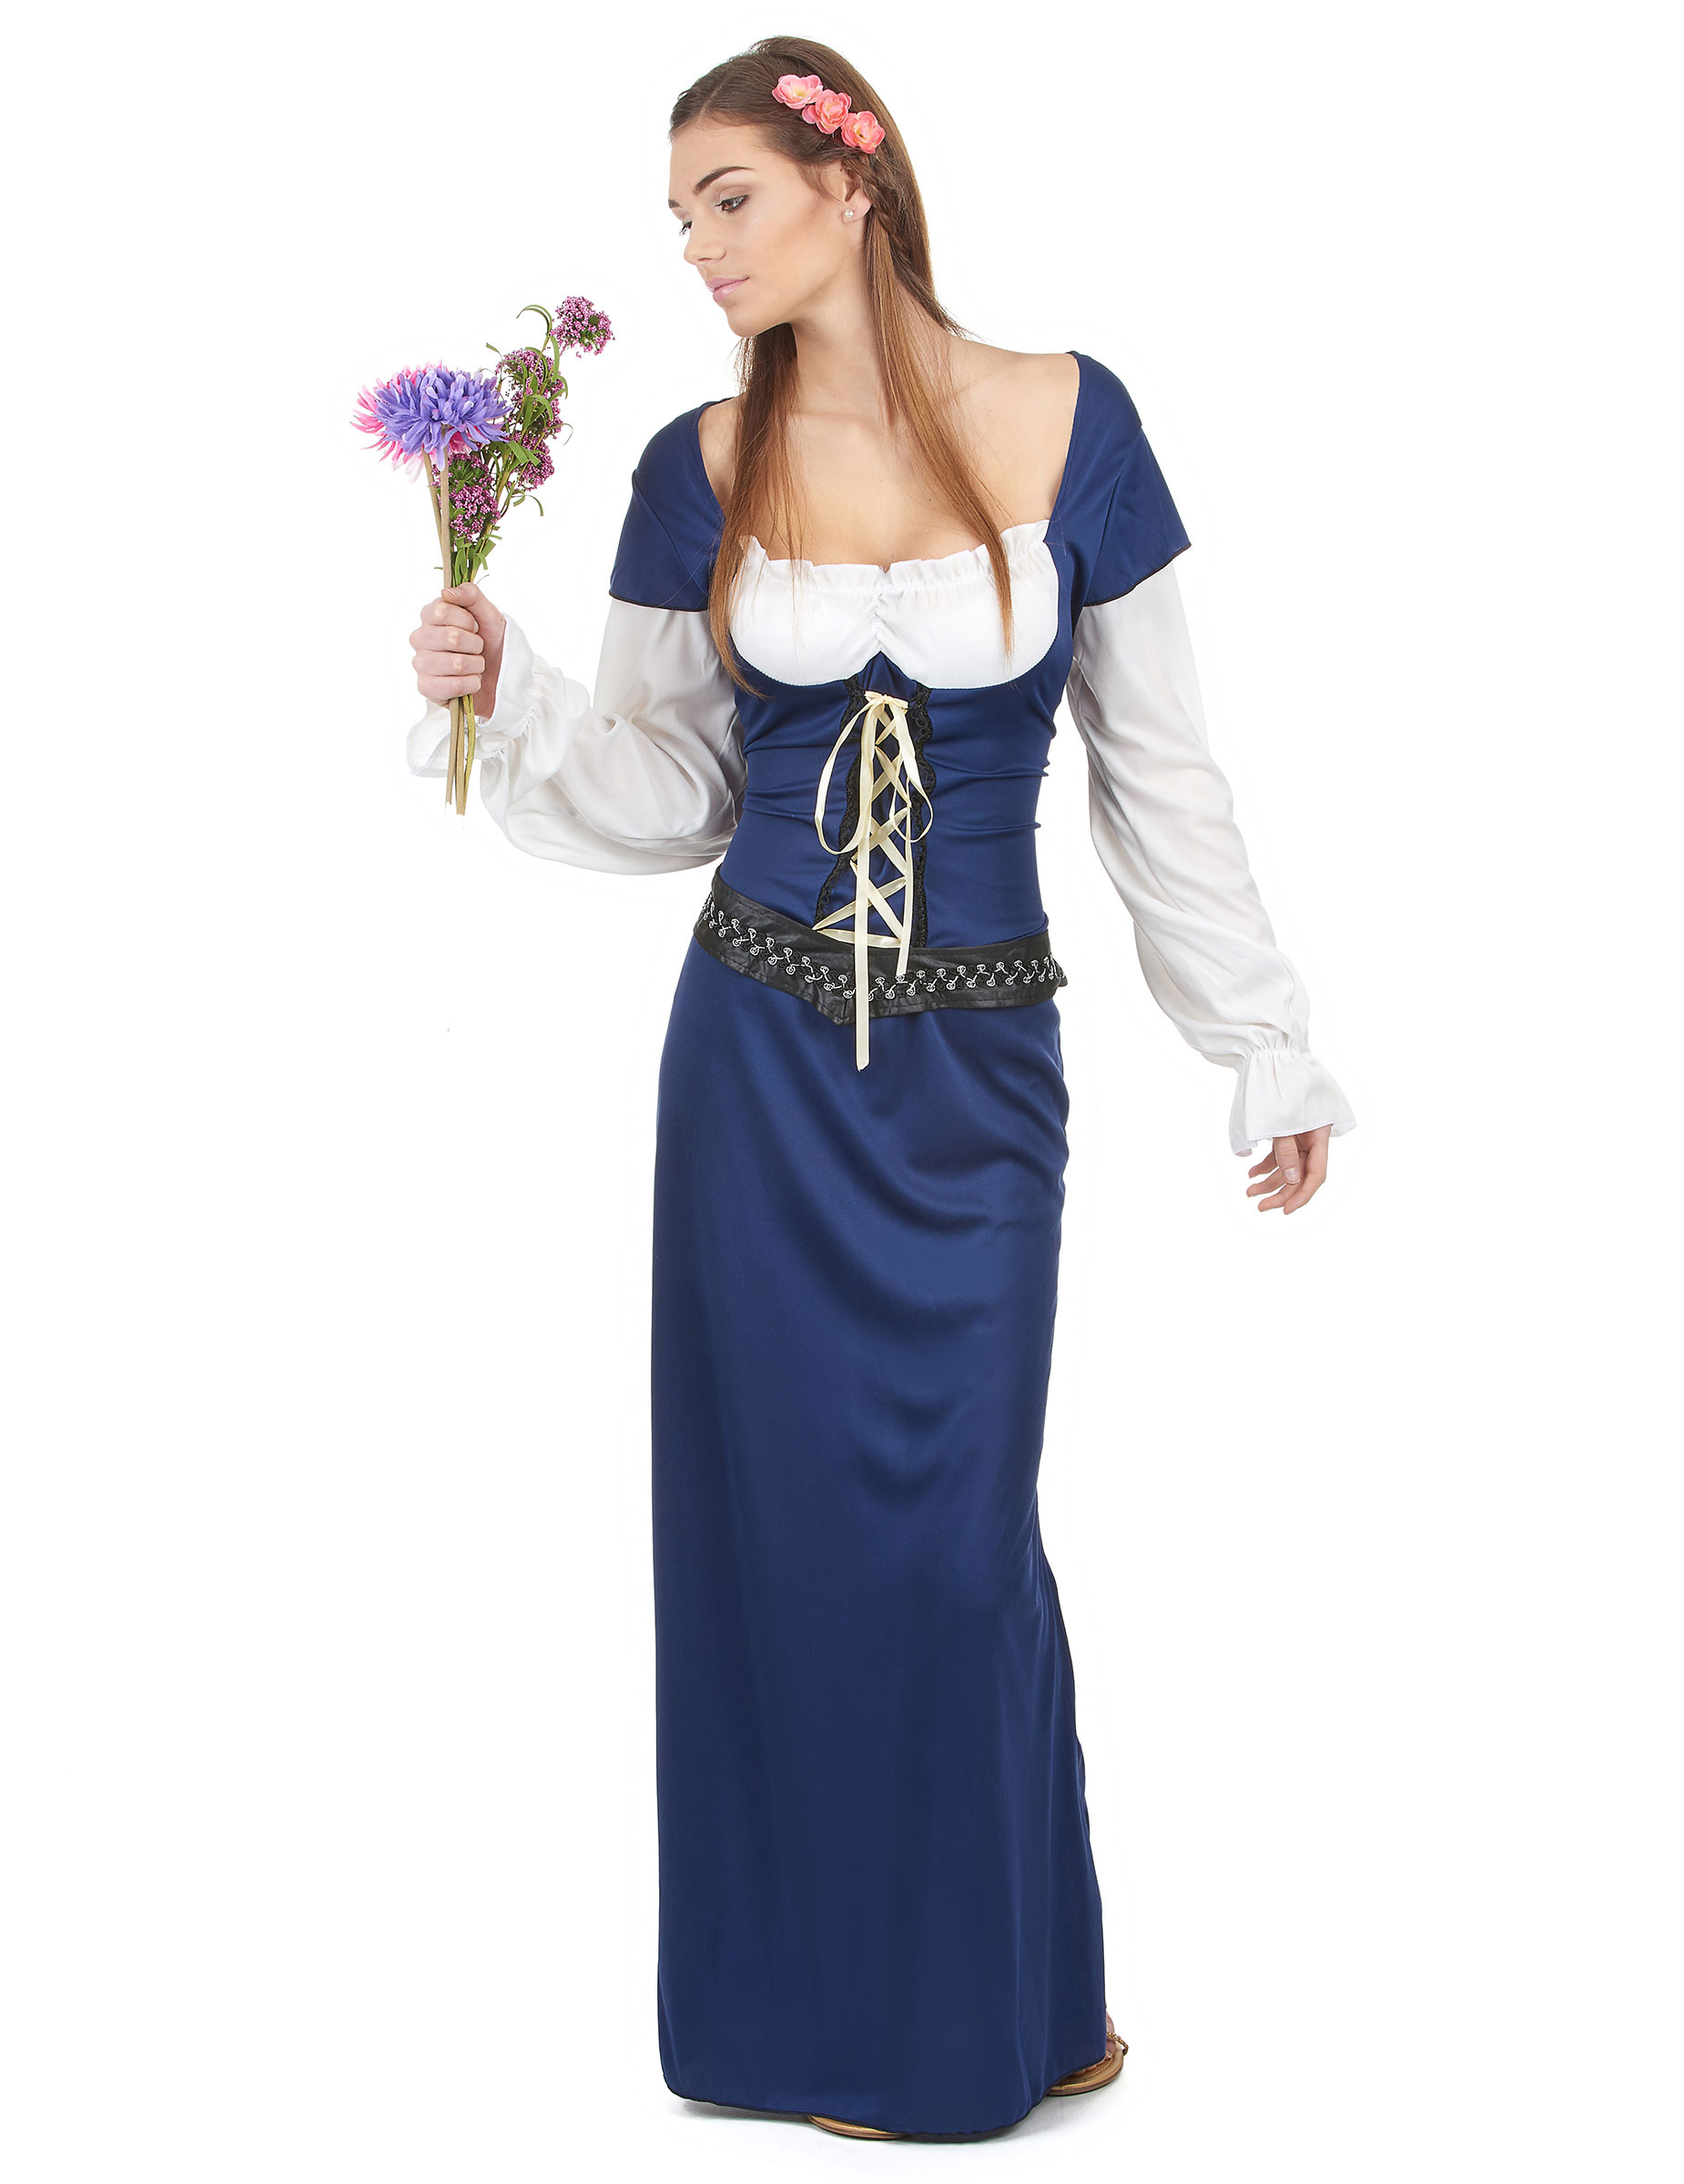 costume bavarese oktoberfest